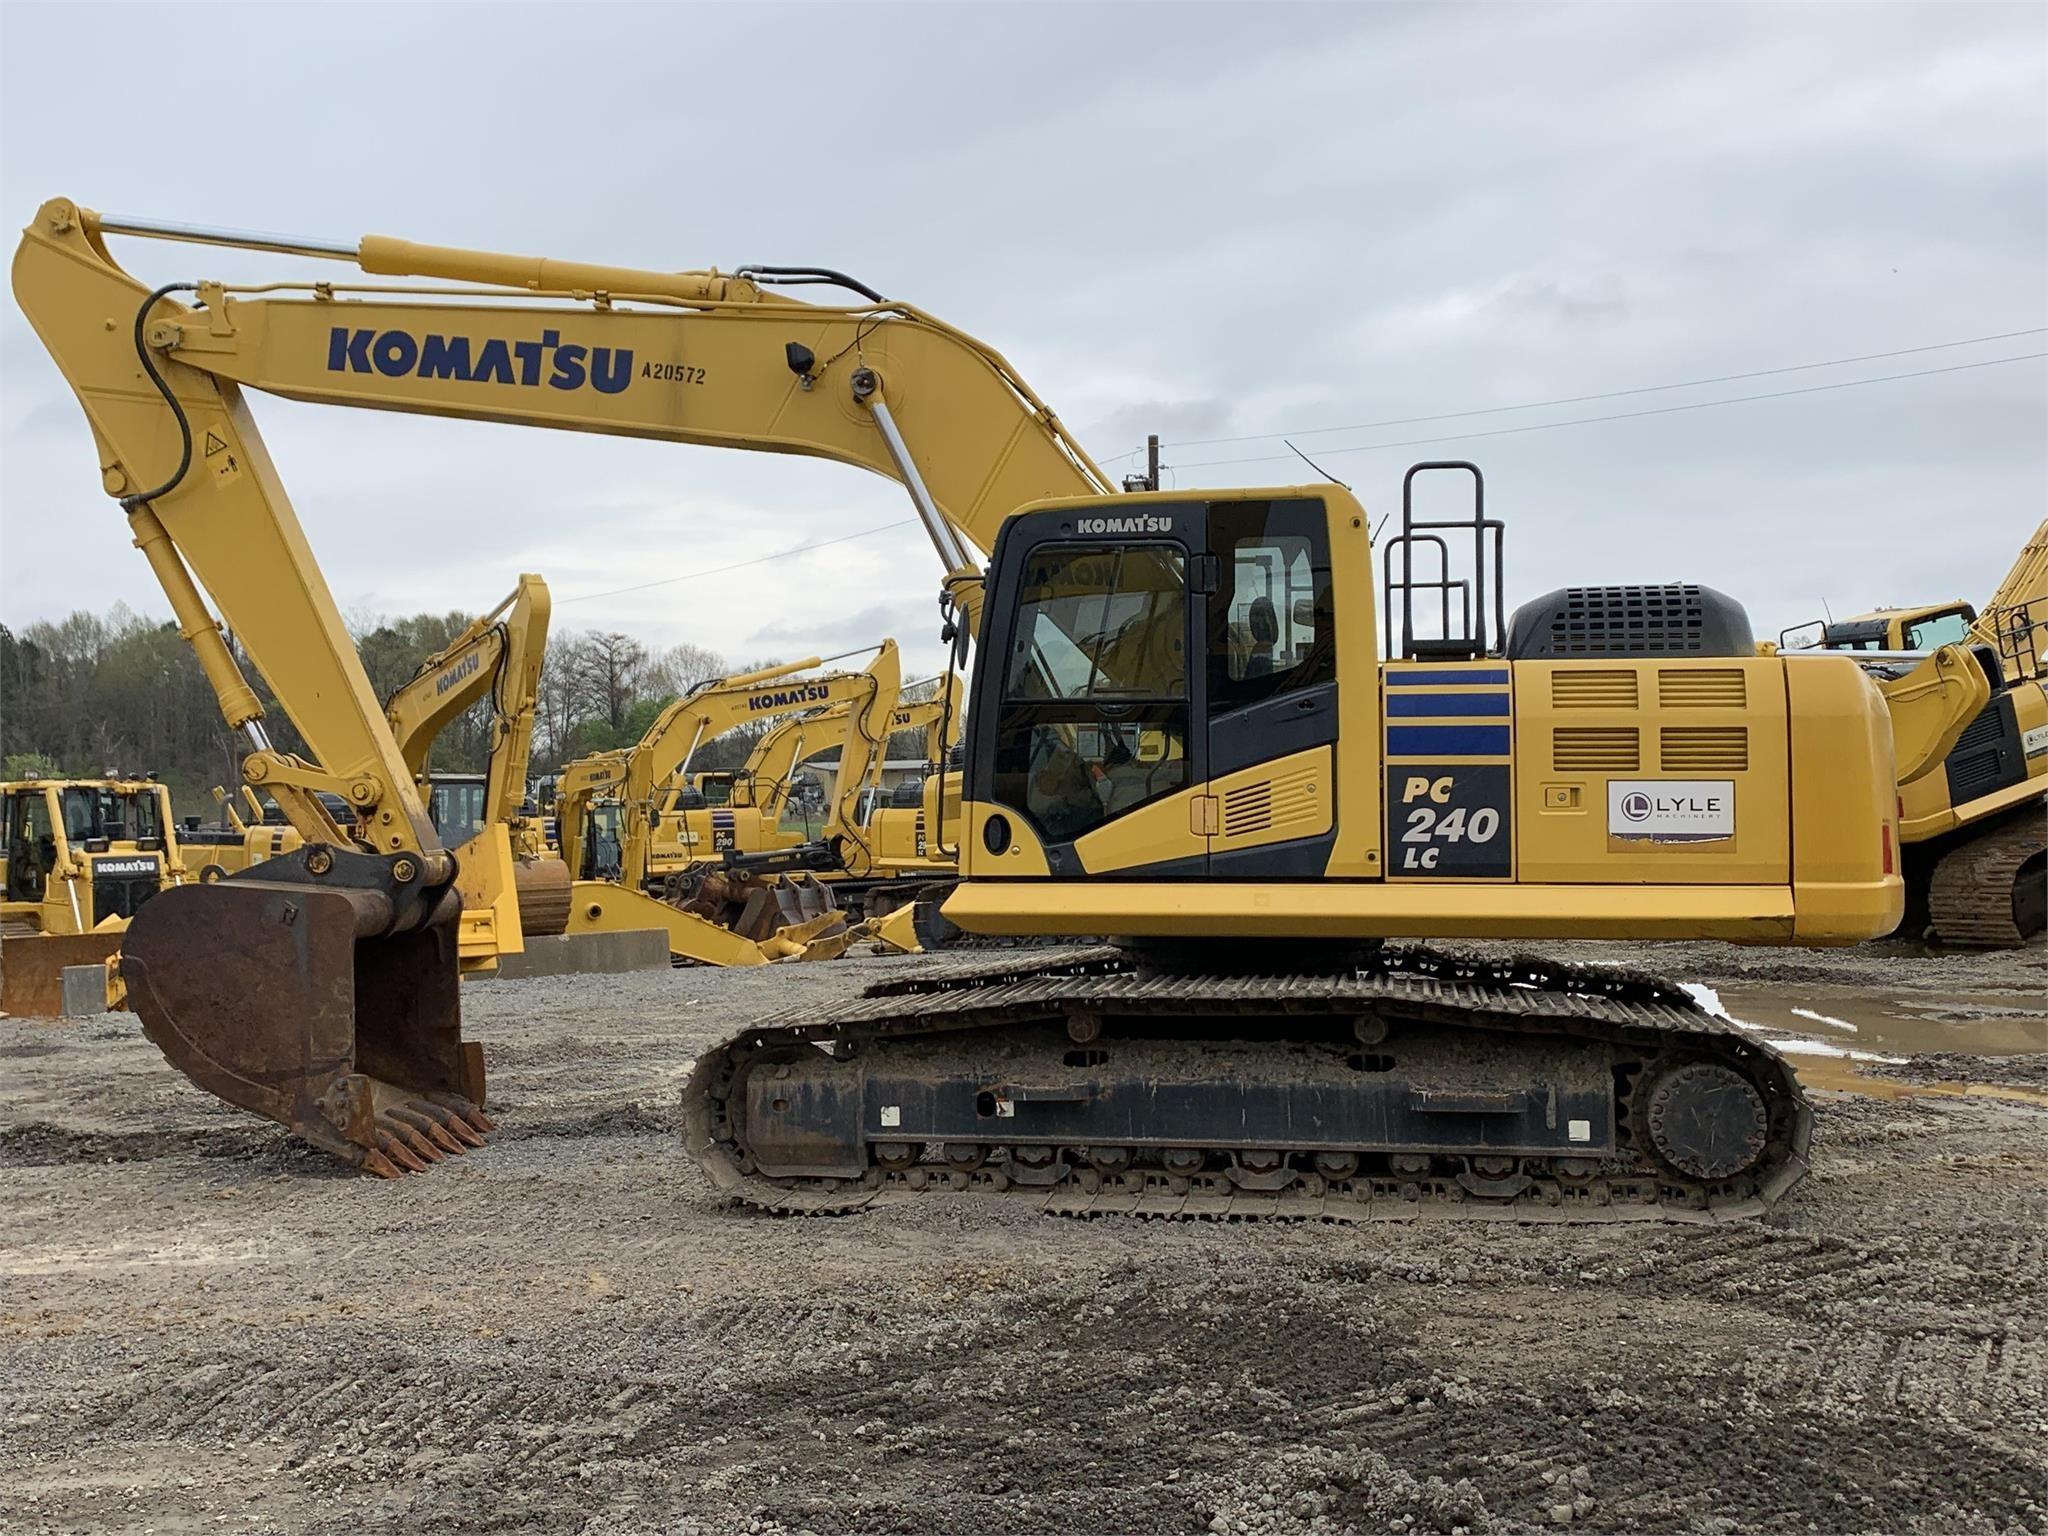 Used, 2017, KOMATSU, PC240 LC-10, Excavators - Crawler